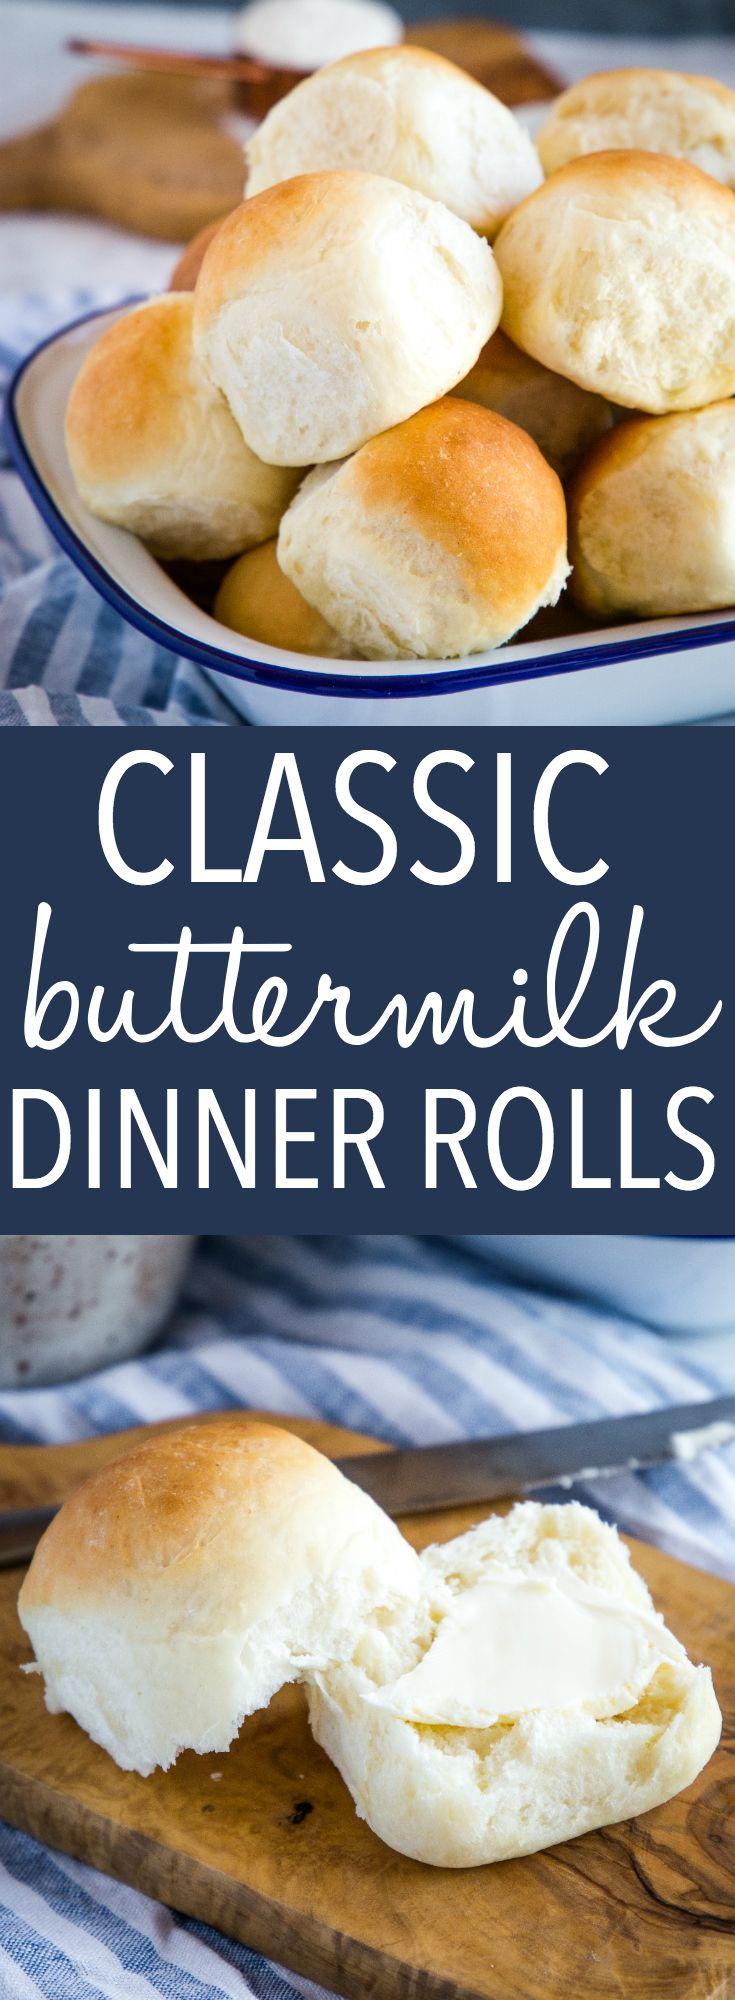 Easy Homemade Classic Buttermilk Buns Dinner Rolls The Busy Baker Recipe Dinner Rolls Recipes Yummy Healthy Breakfast